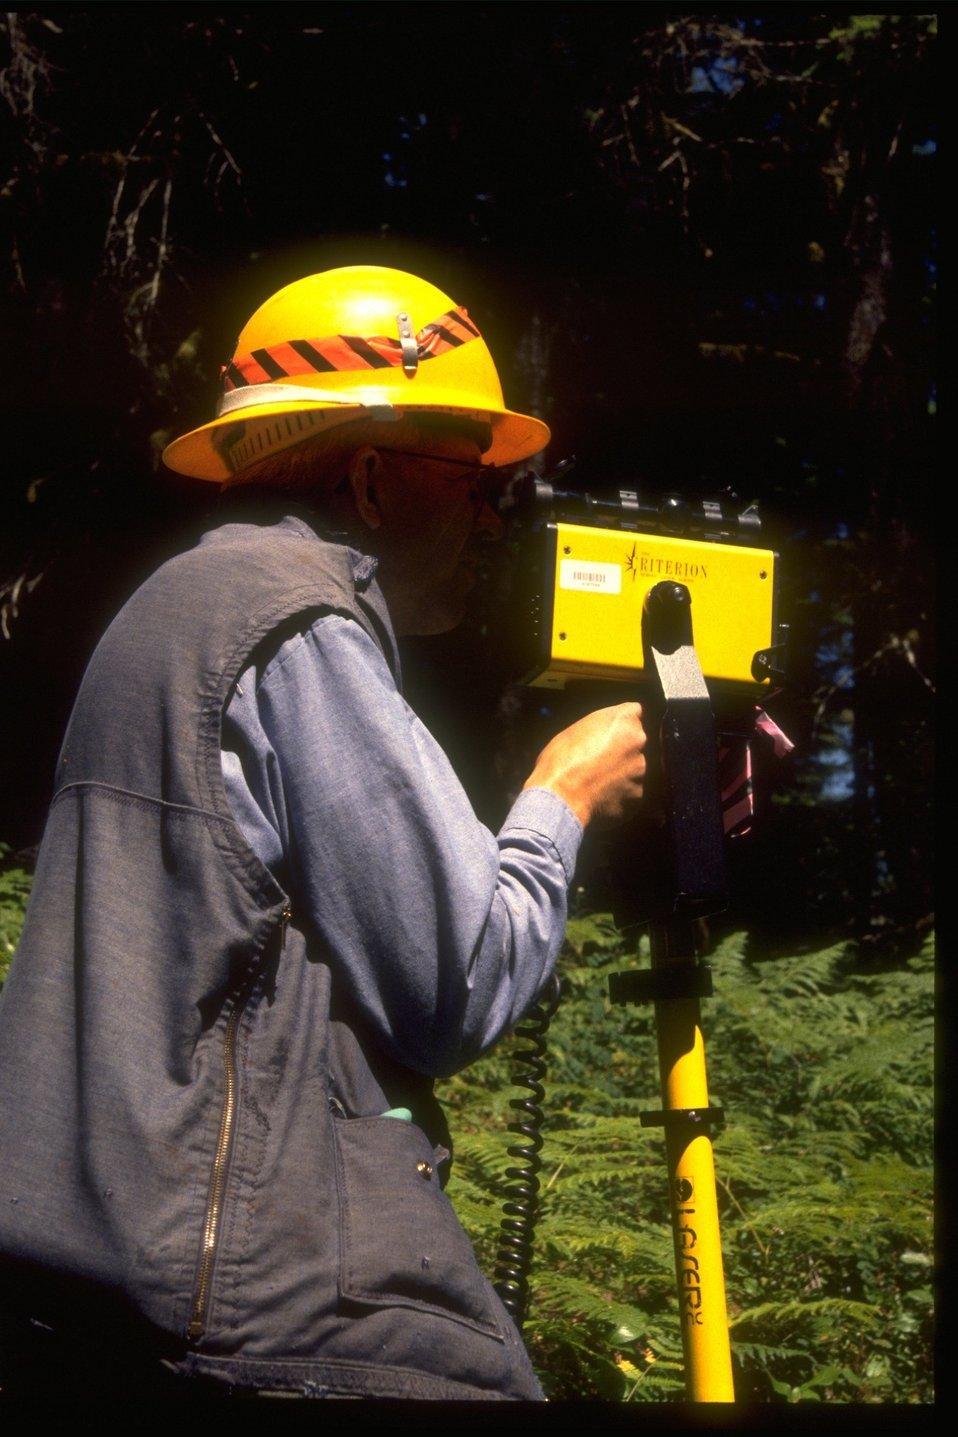 Forester uses radar gun to survey.